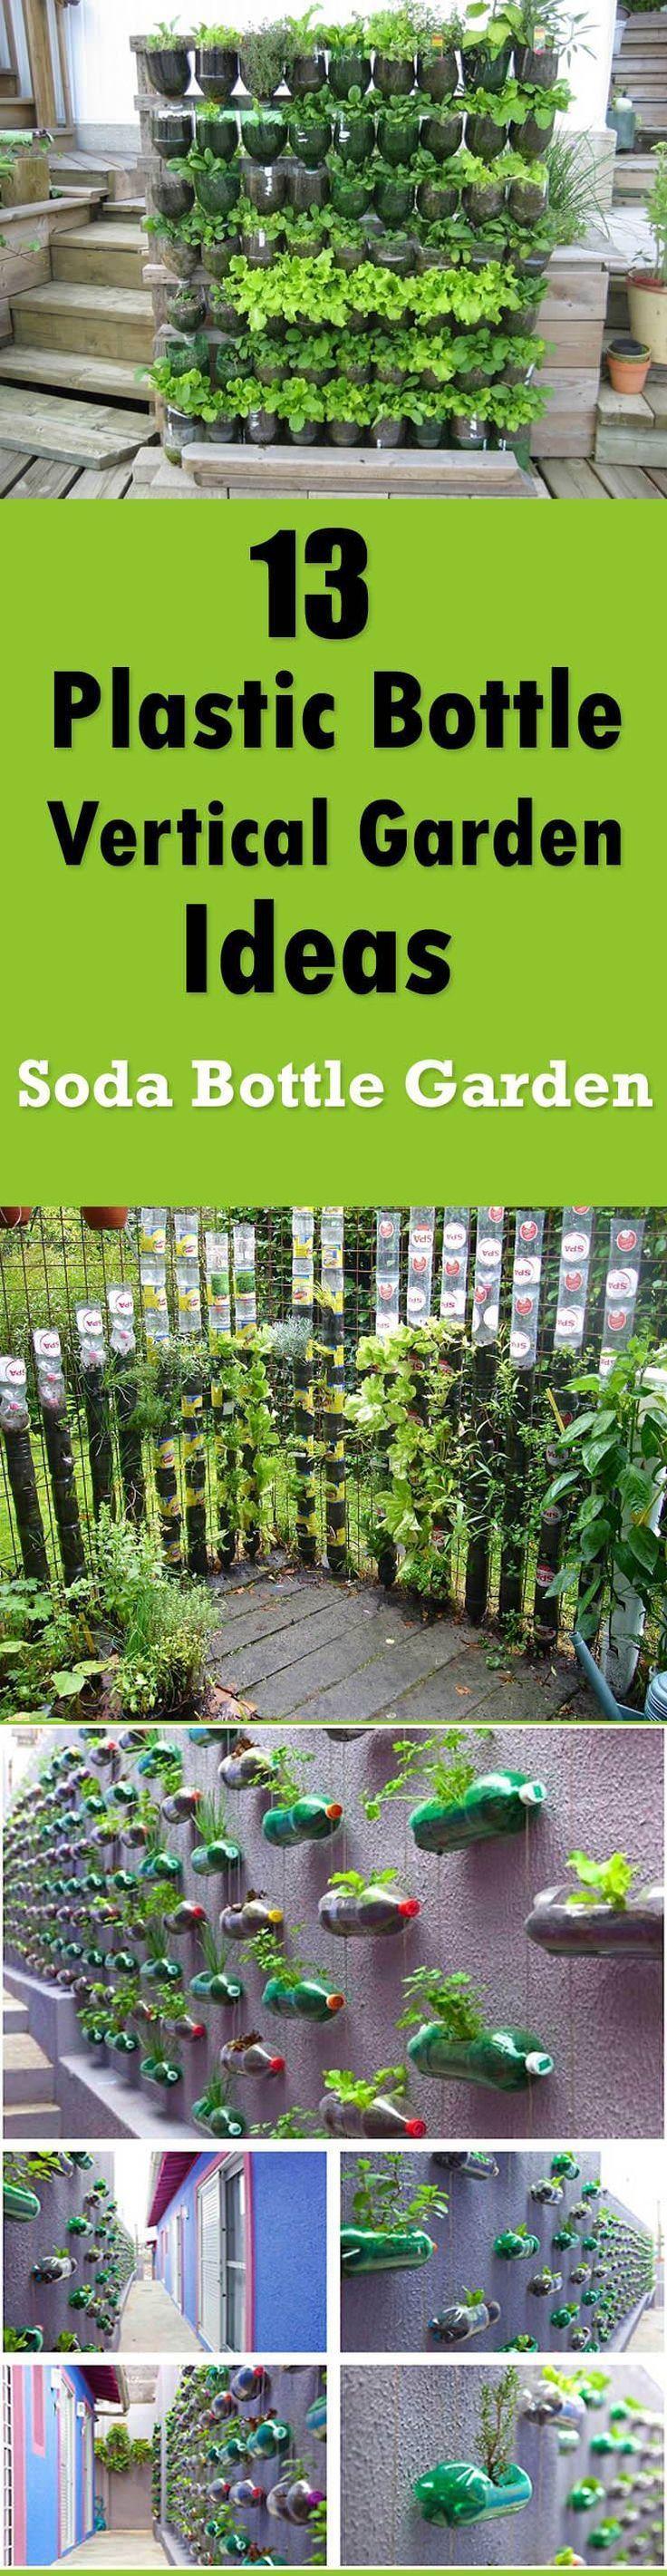 13 Plastic Bottle Vertical Garden Ideas